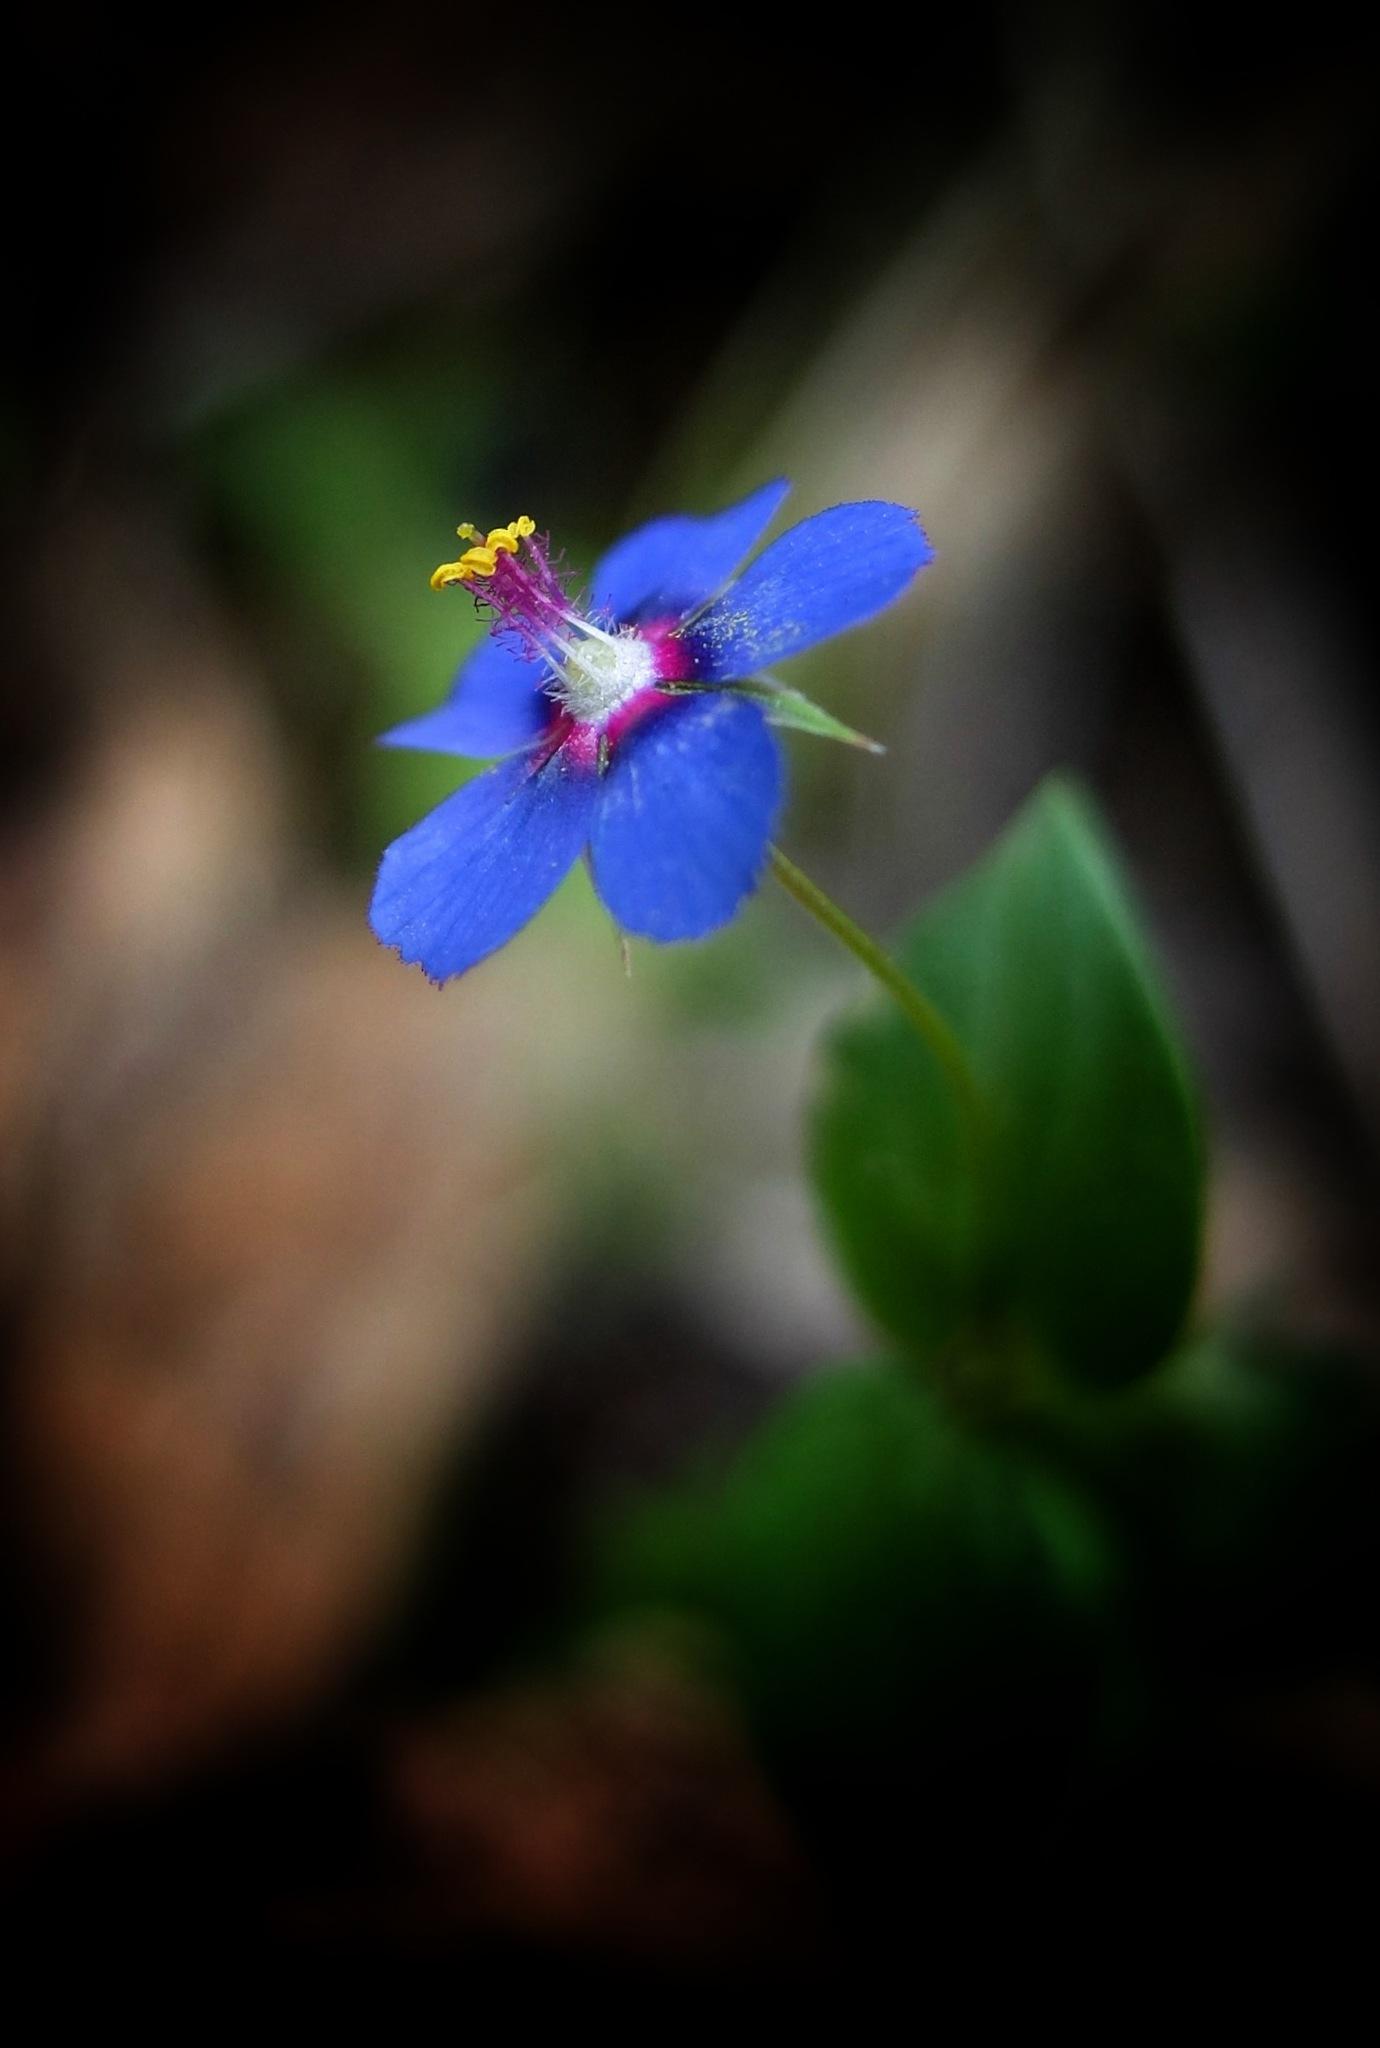 Spring  by TC Funda Sertdemir